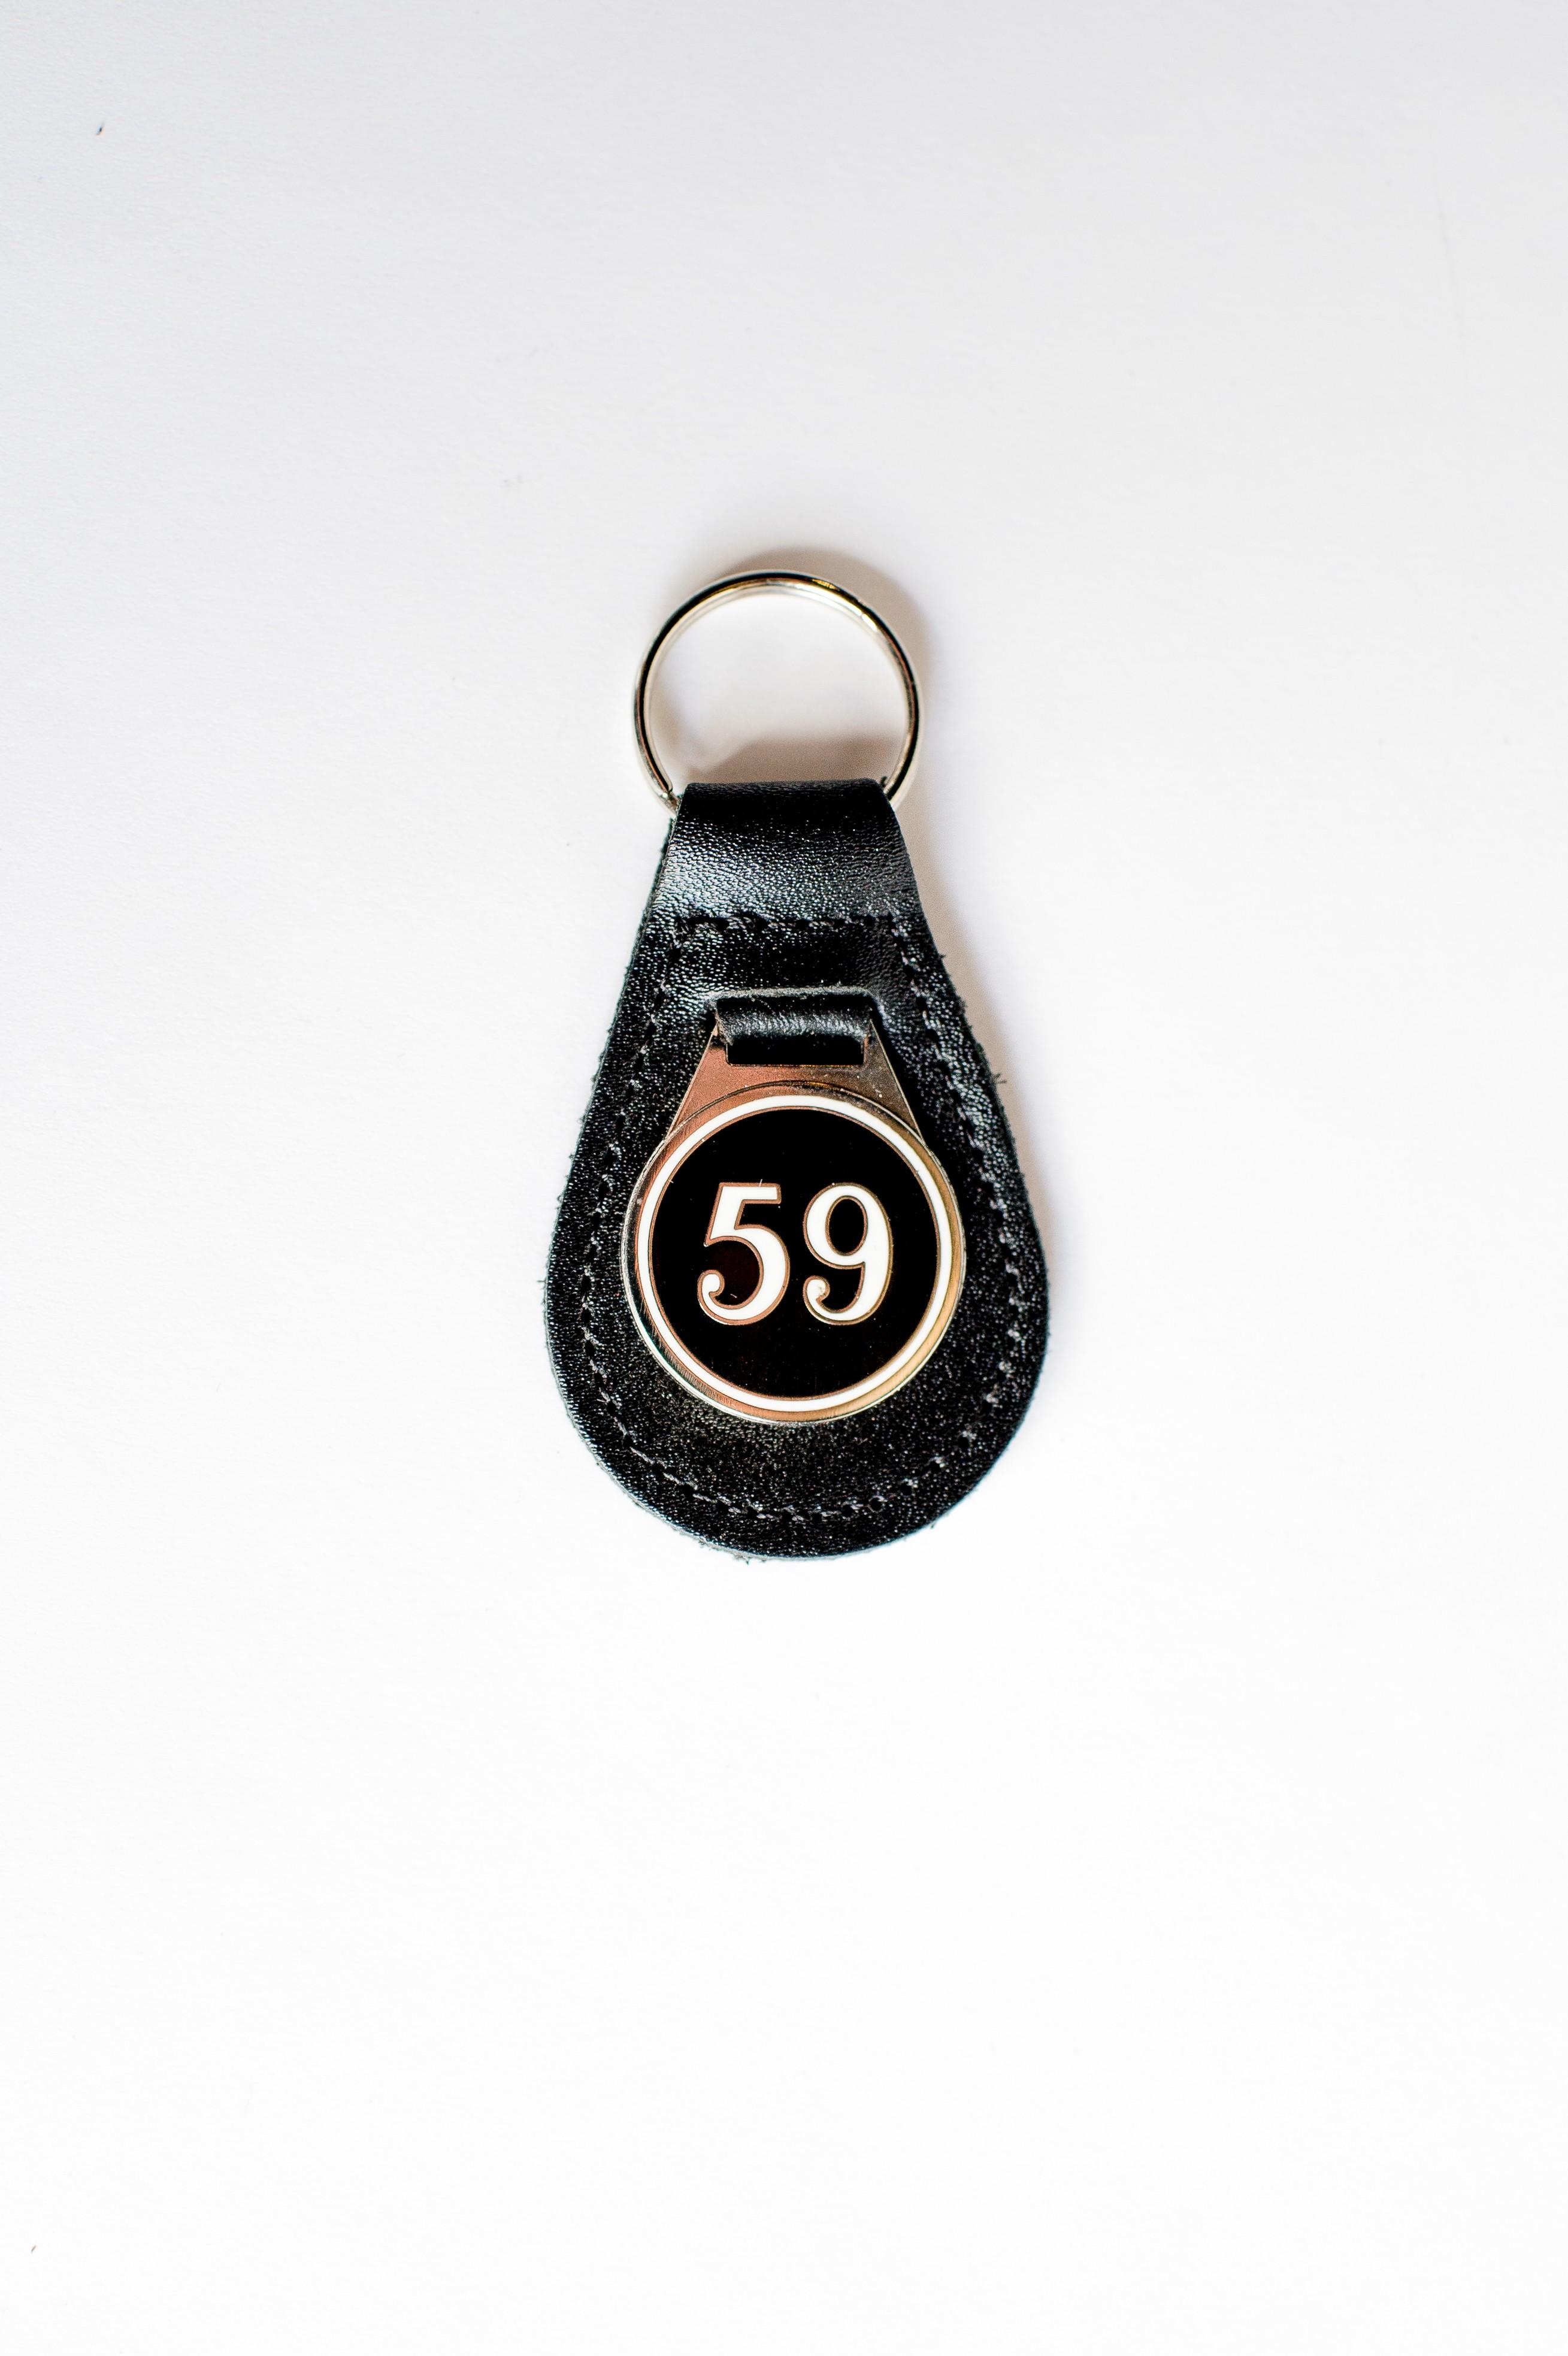 59 Club Key Fob